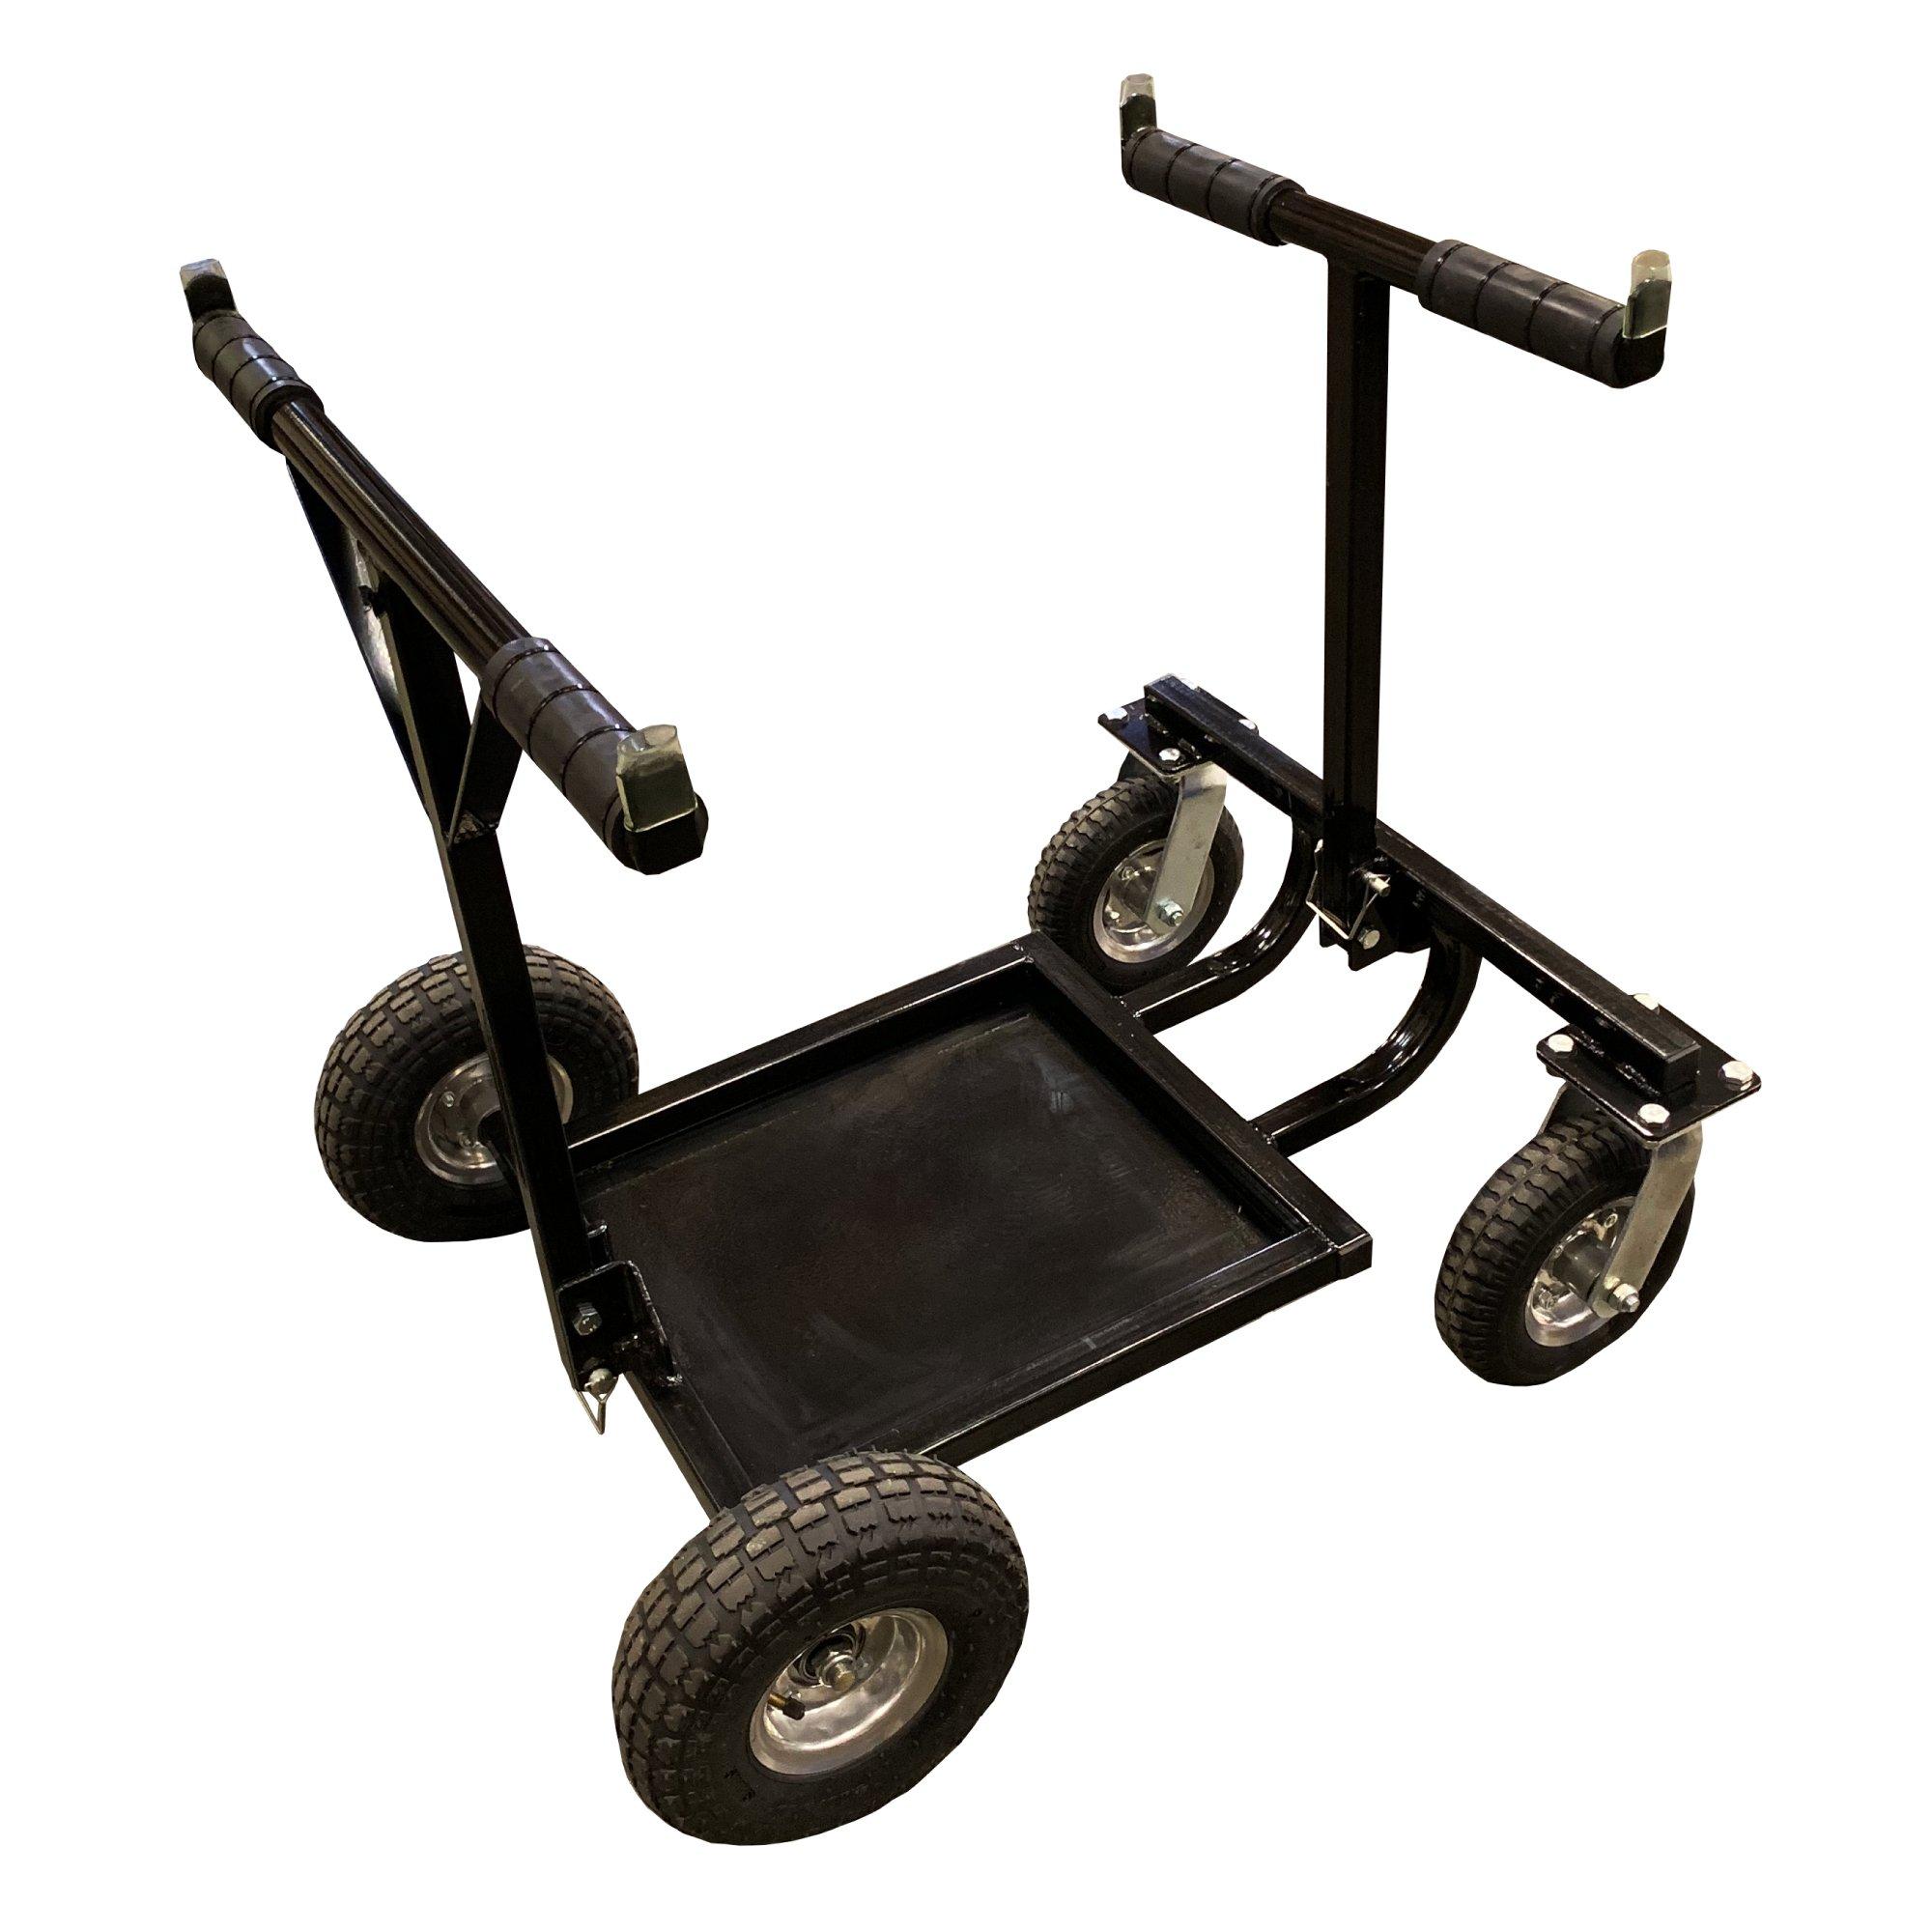 RLV Super Heavy Duty Kart Stand